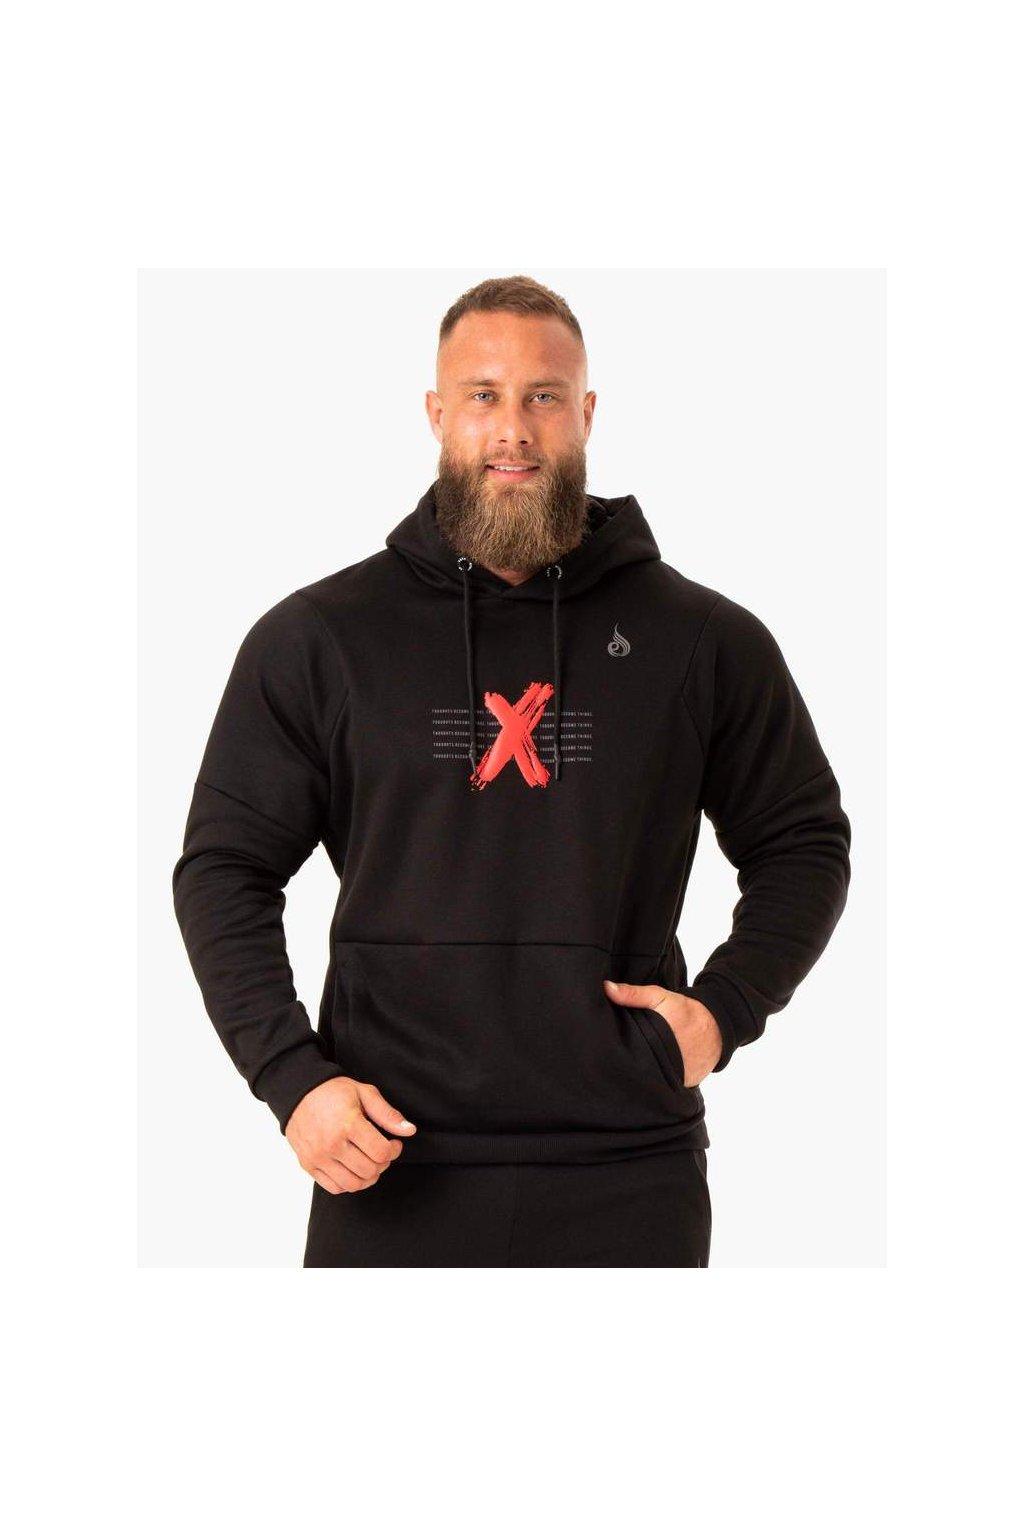 rwxkg fleece hoodie black clothing ryderwear 630845 1000x1000